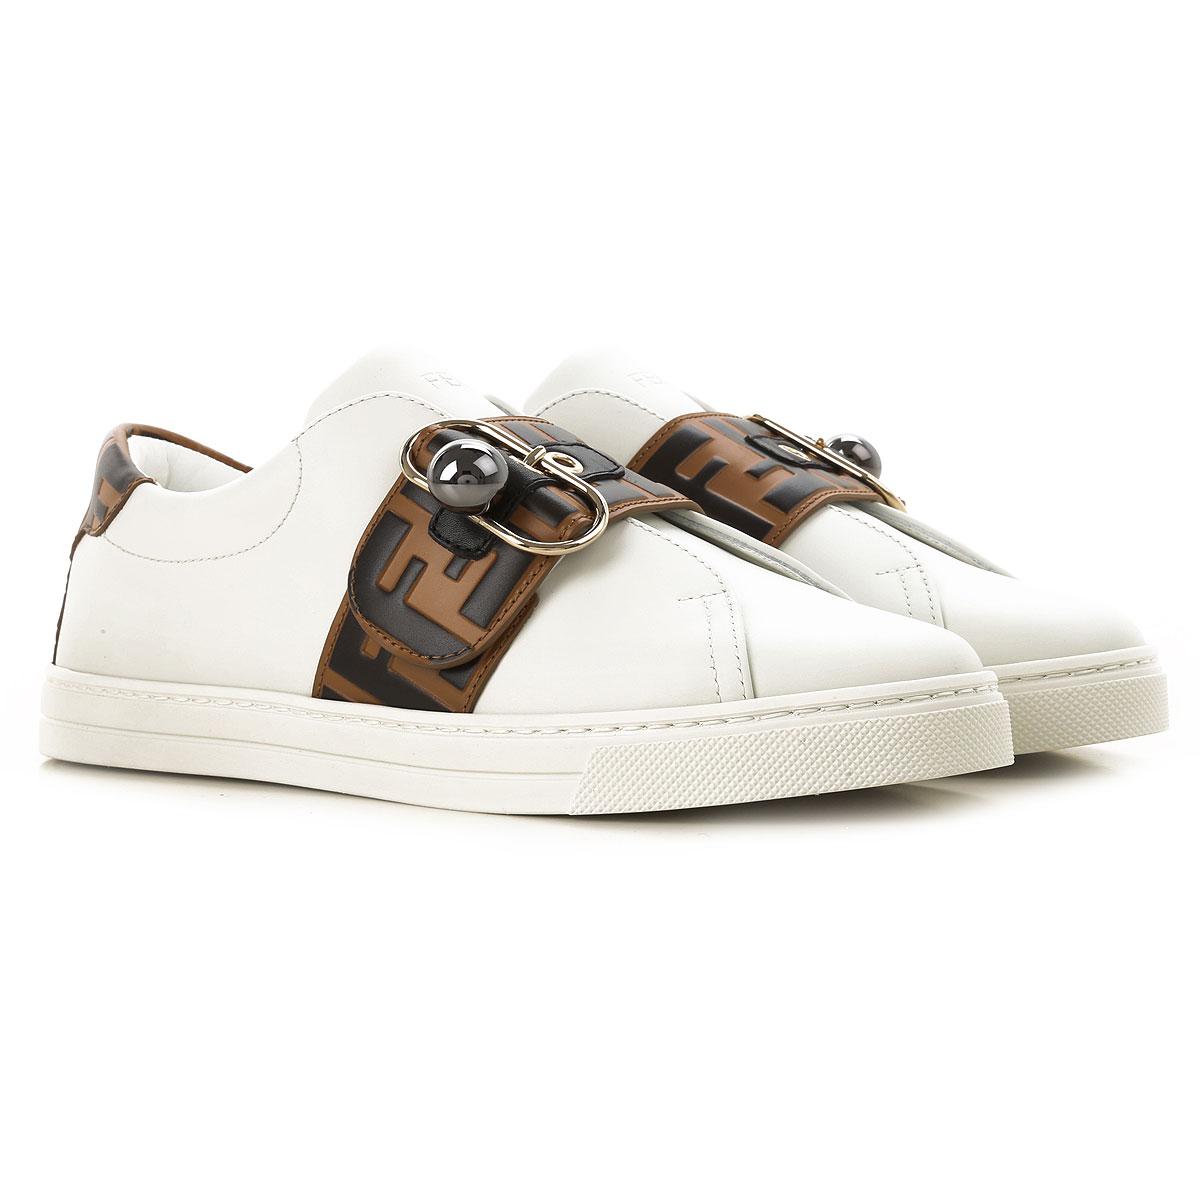 1057e0cd3827 Fendi. Shoes for Women